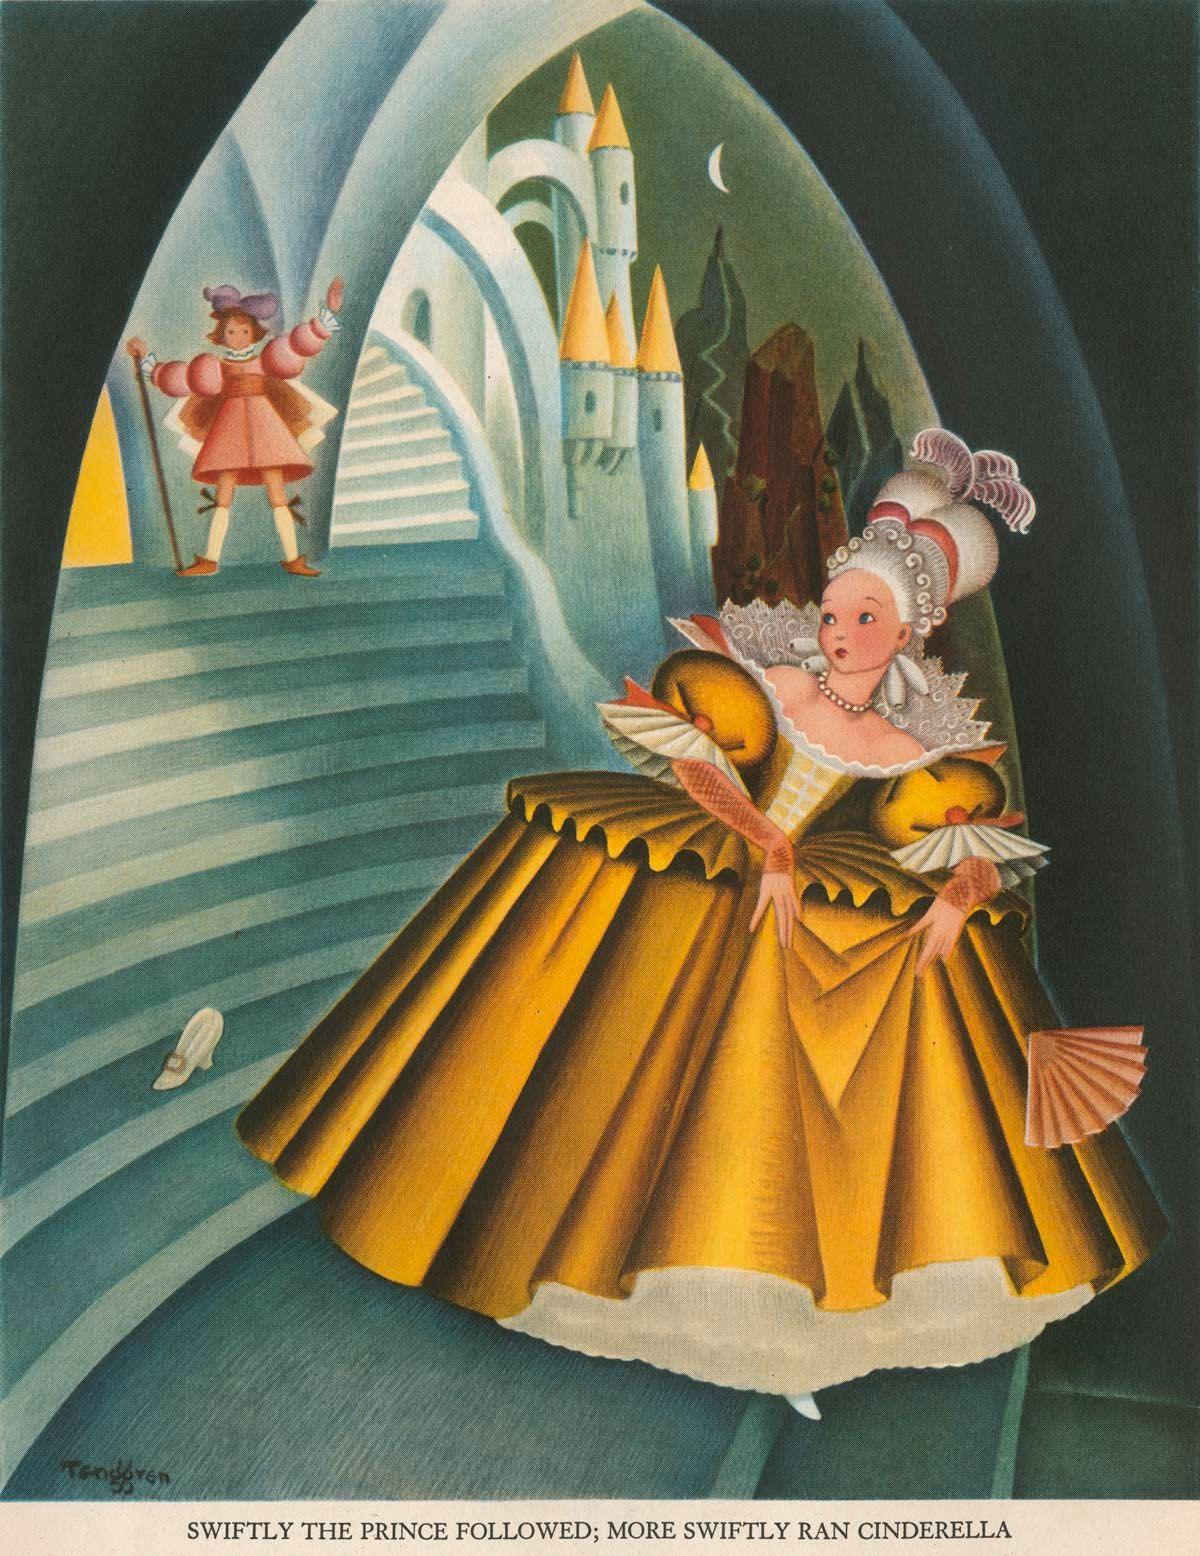 Gustaf Adolf Tenggren - The Tenggren tell it again book - Cinderella Diario Nordico